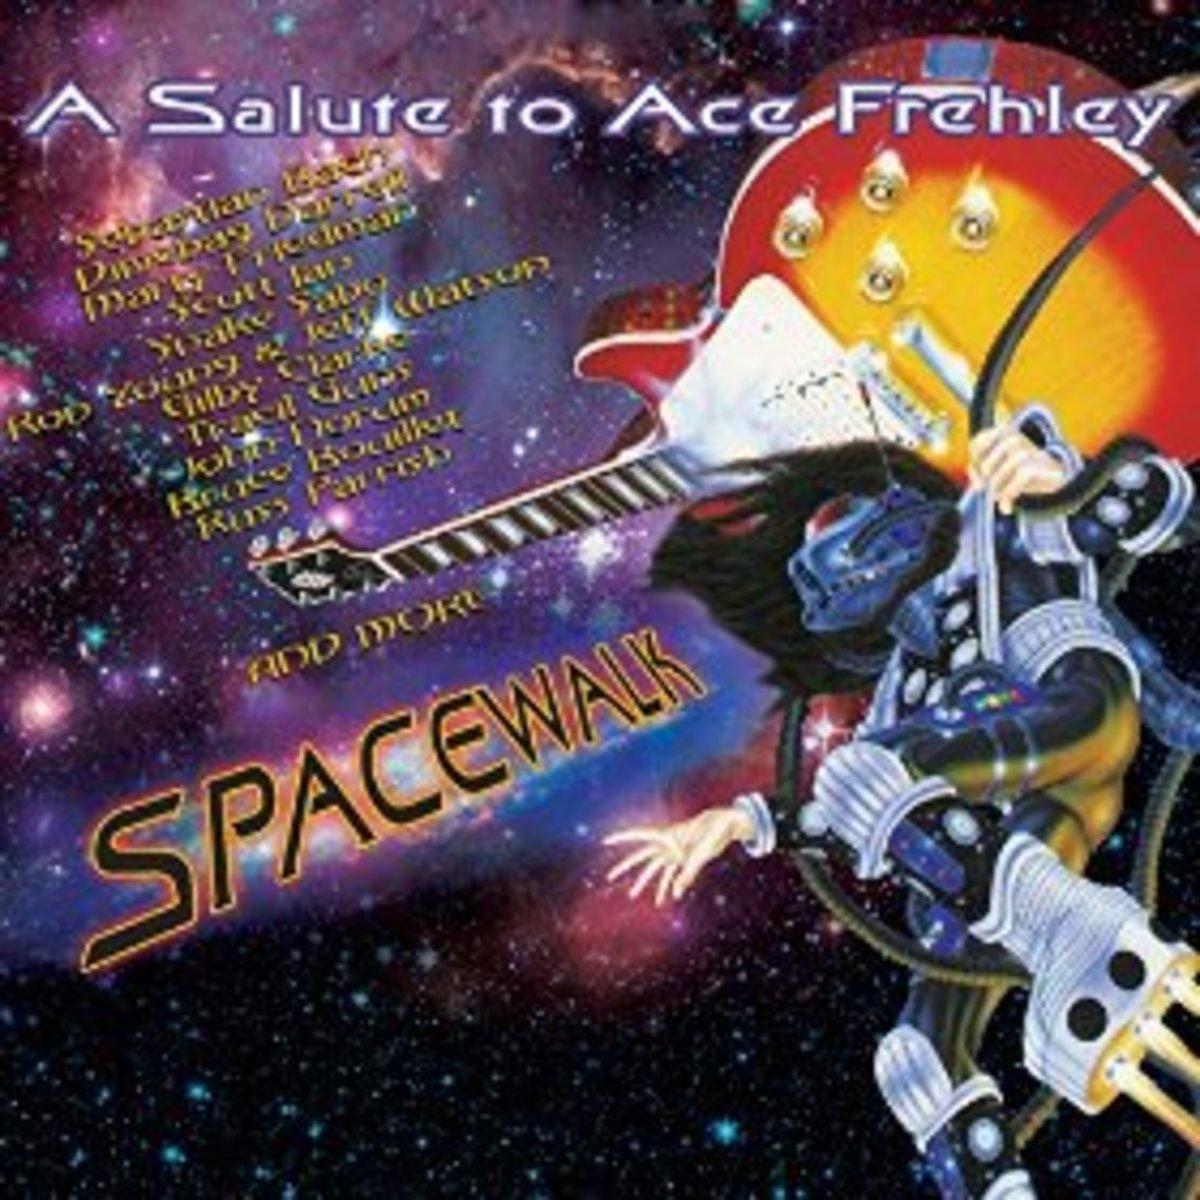 ace-frehley-comp